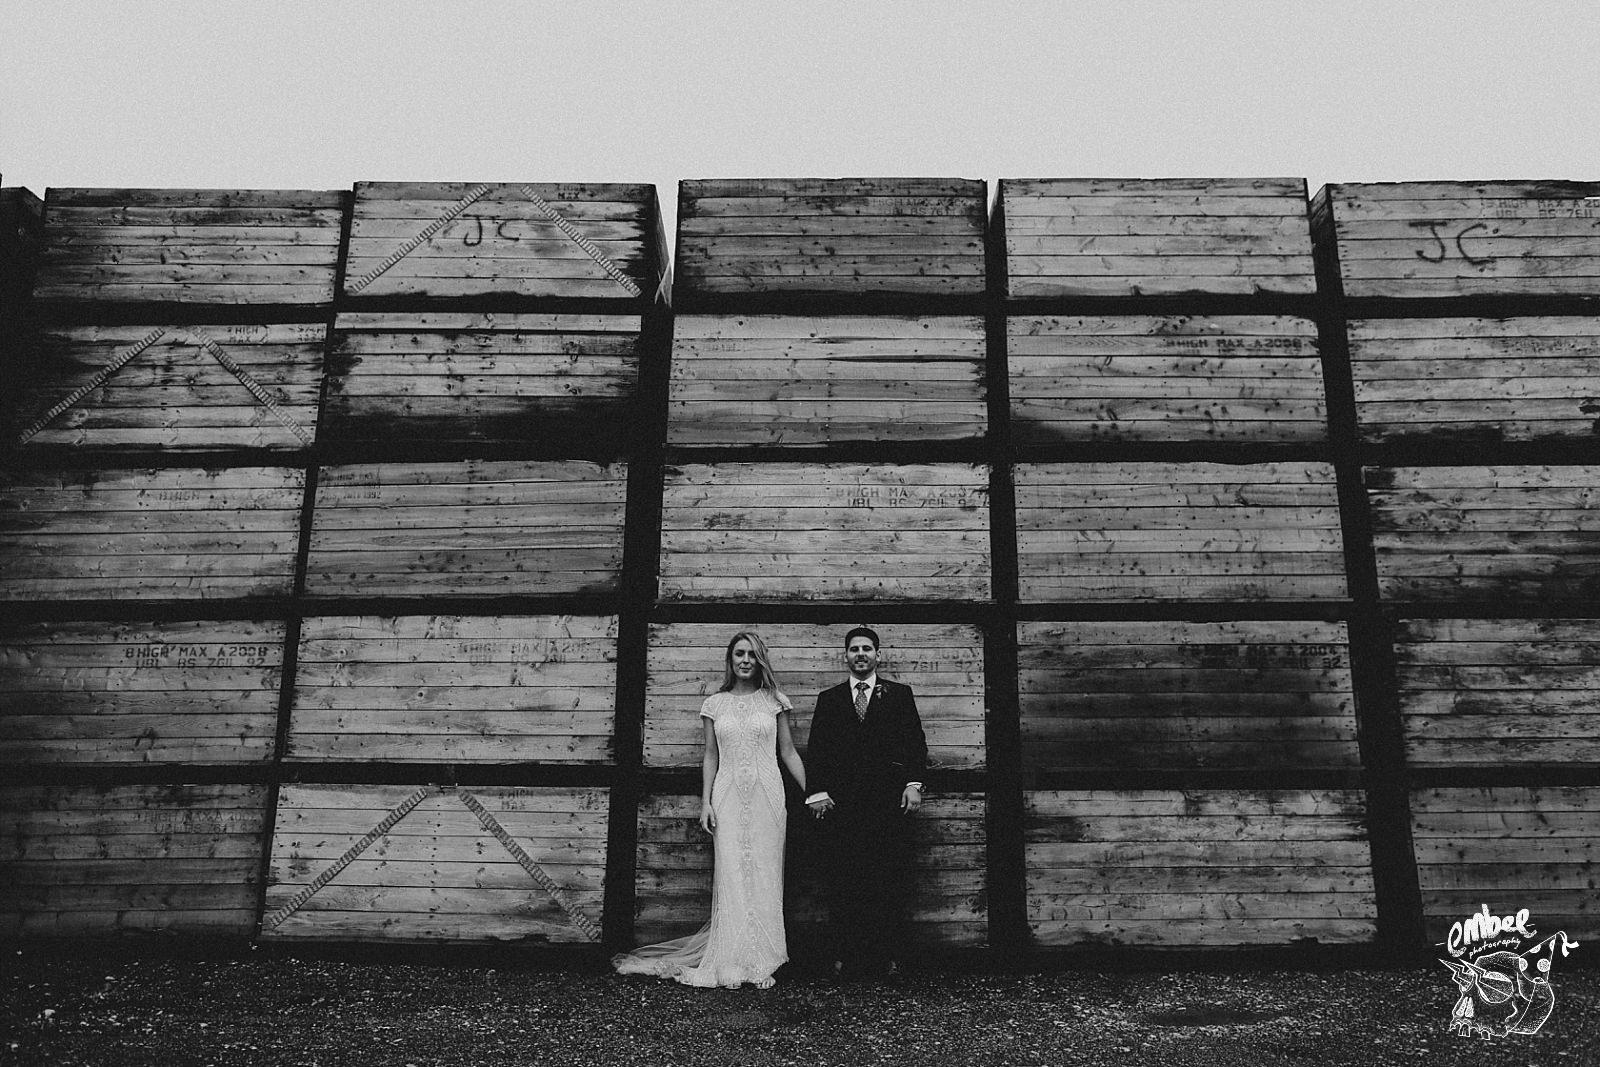 alternative wedding photography portraits of bride and groom